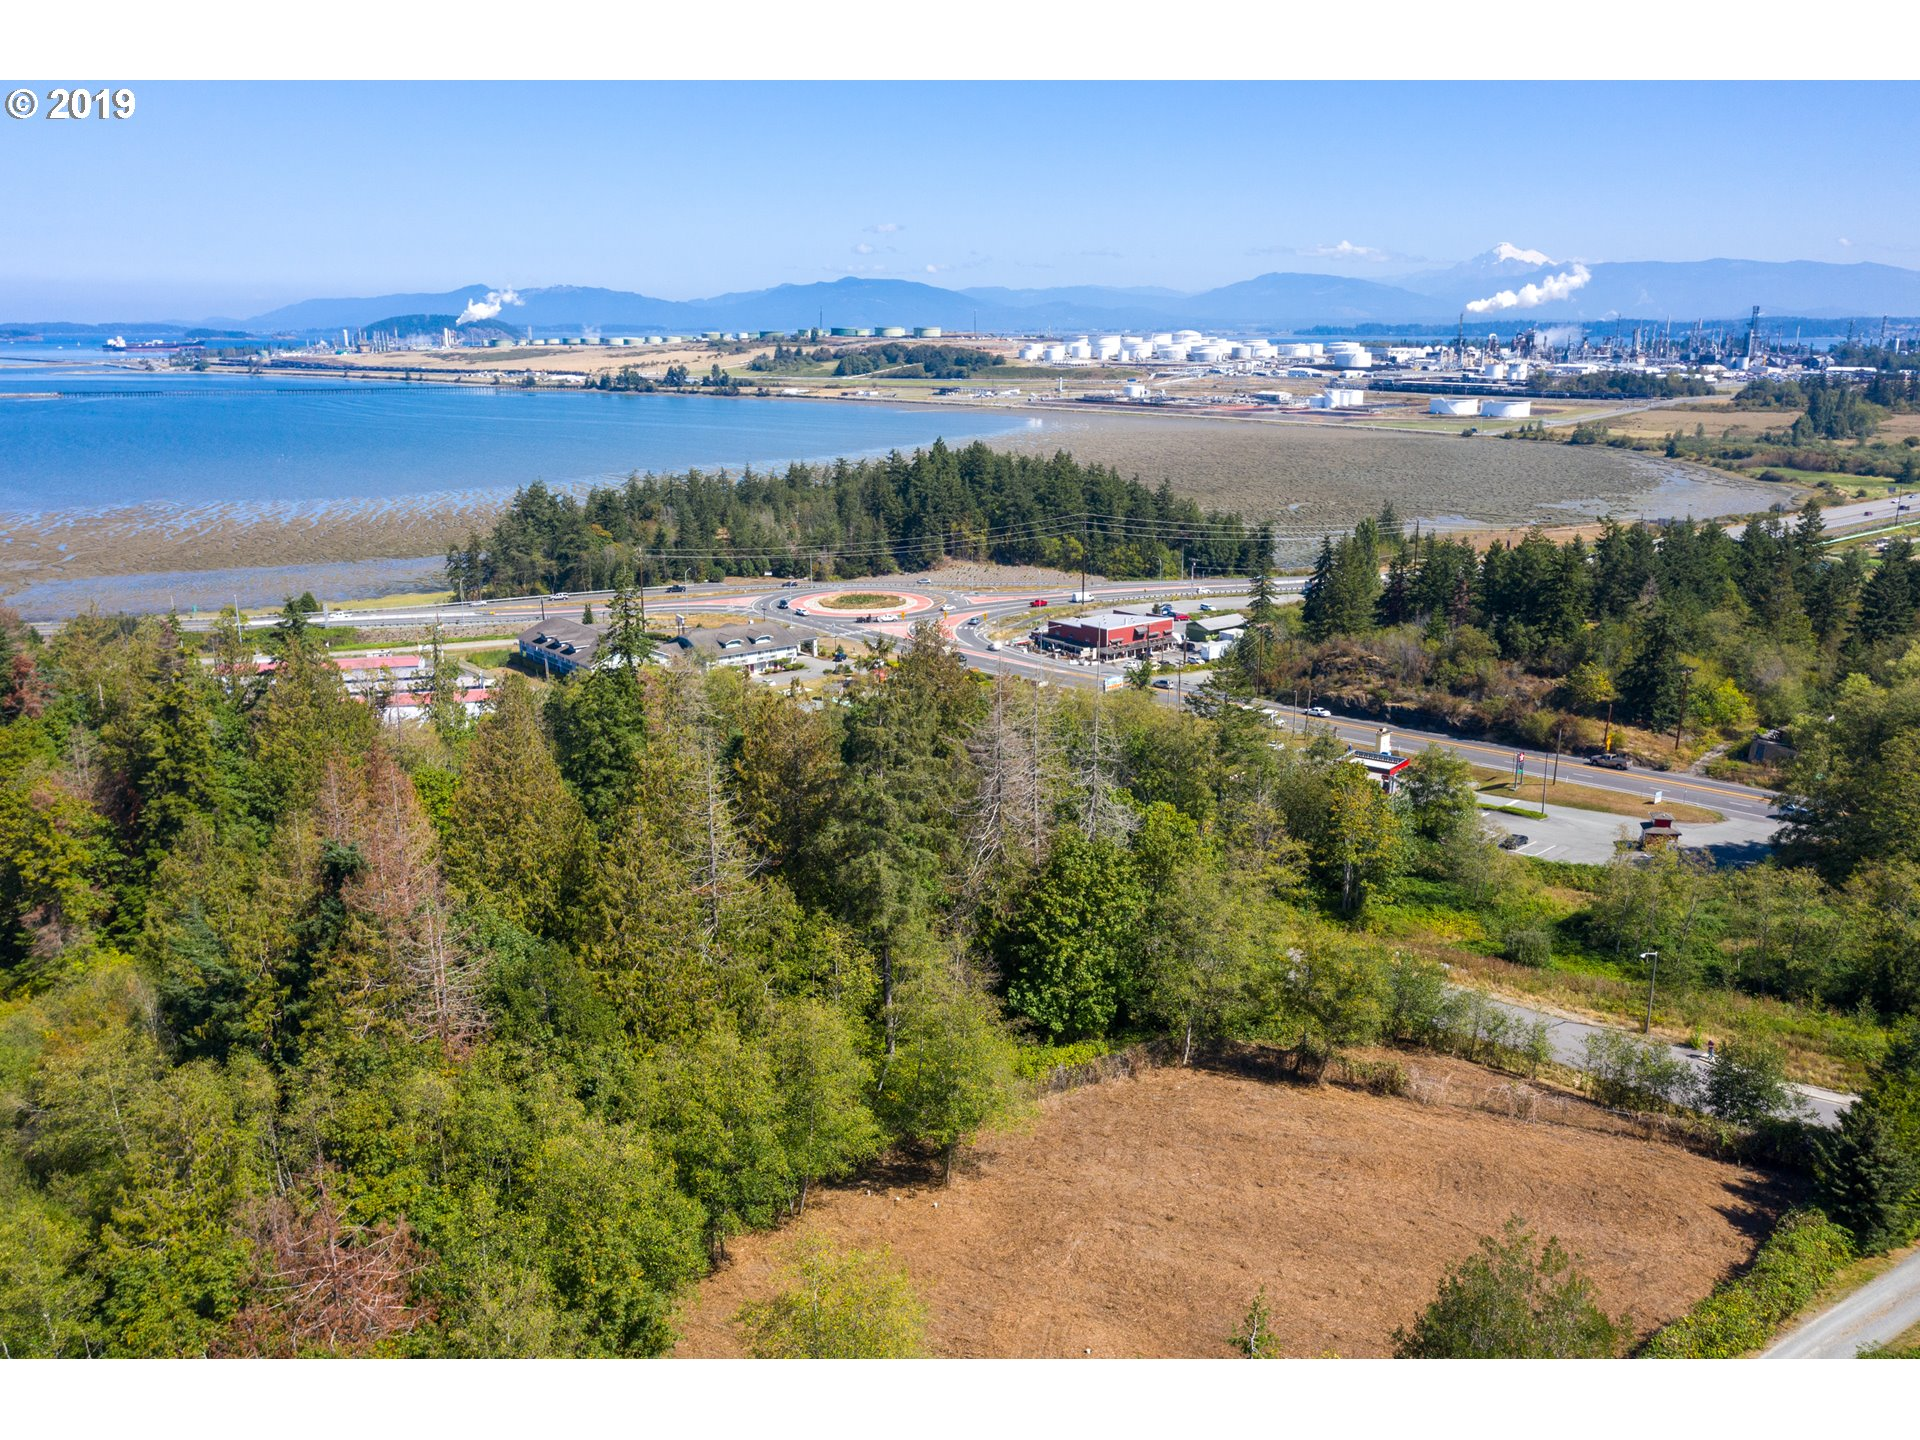 7603 S Fidalgo Bay RD, Anacortes, Washington 98221, ,Lots And Land,For Sale,7603 S Fidalgo Bay RD,19146402